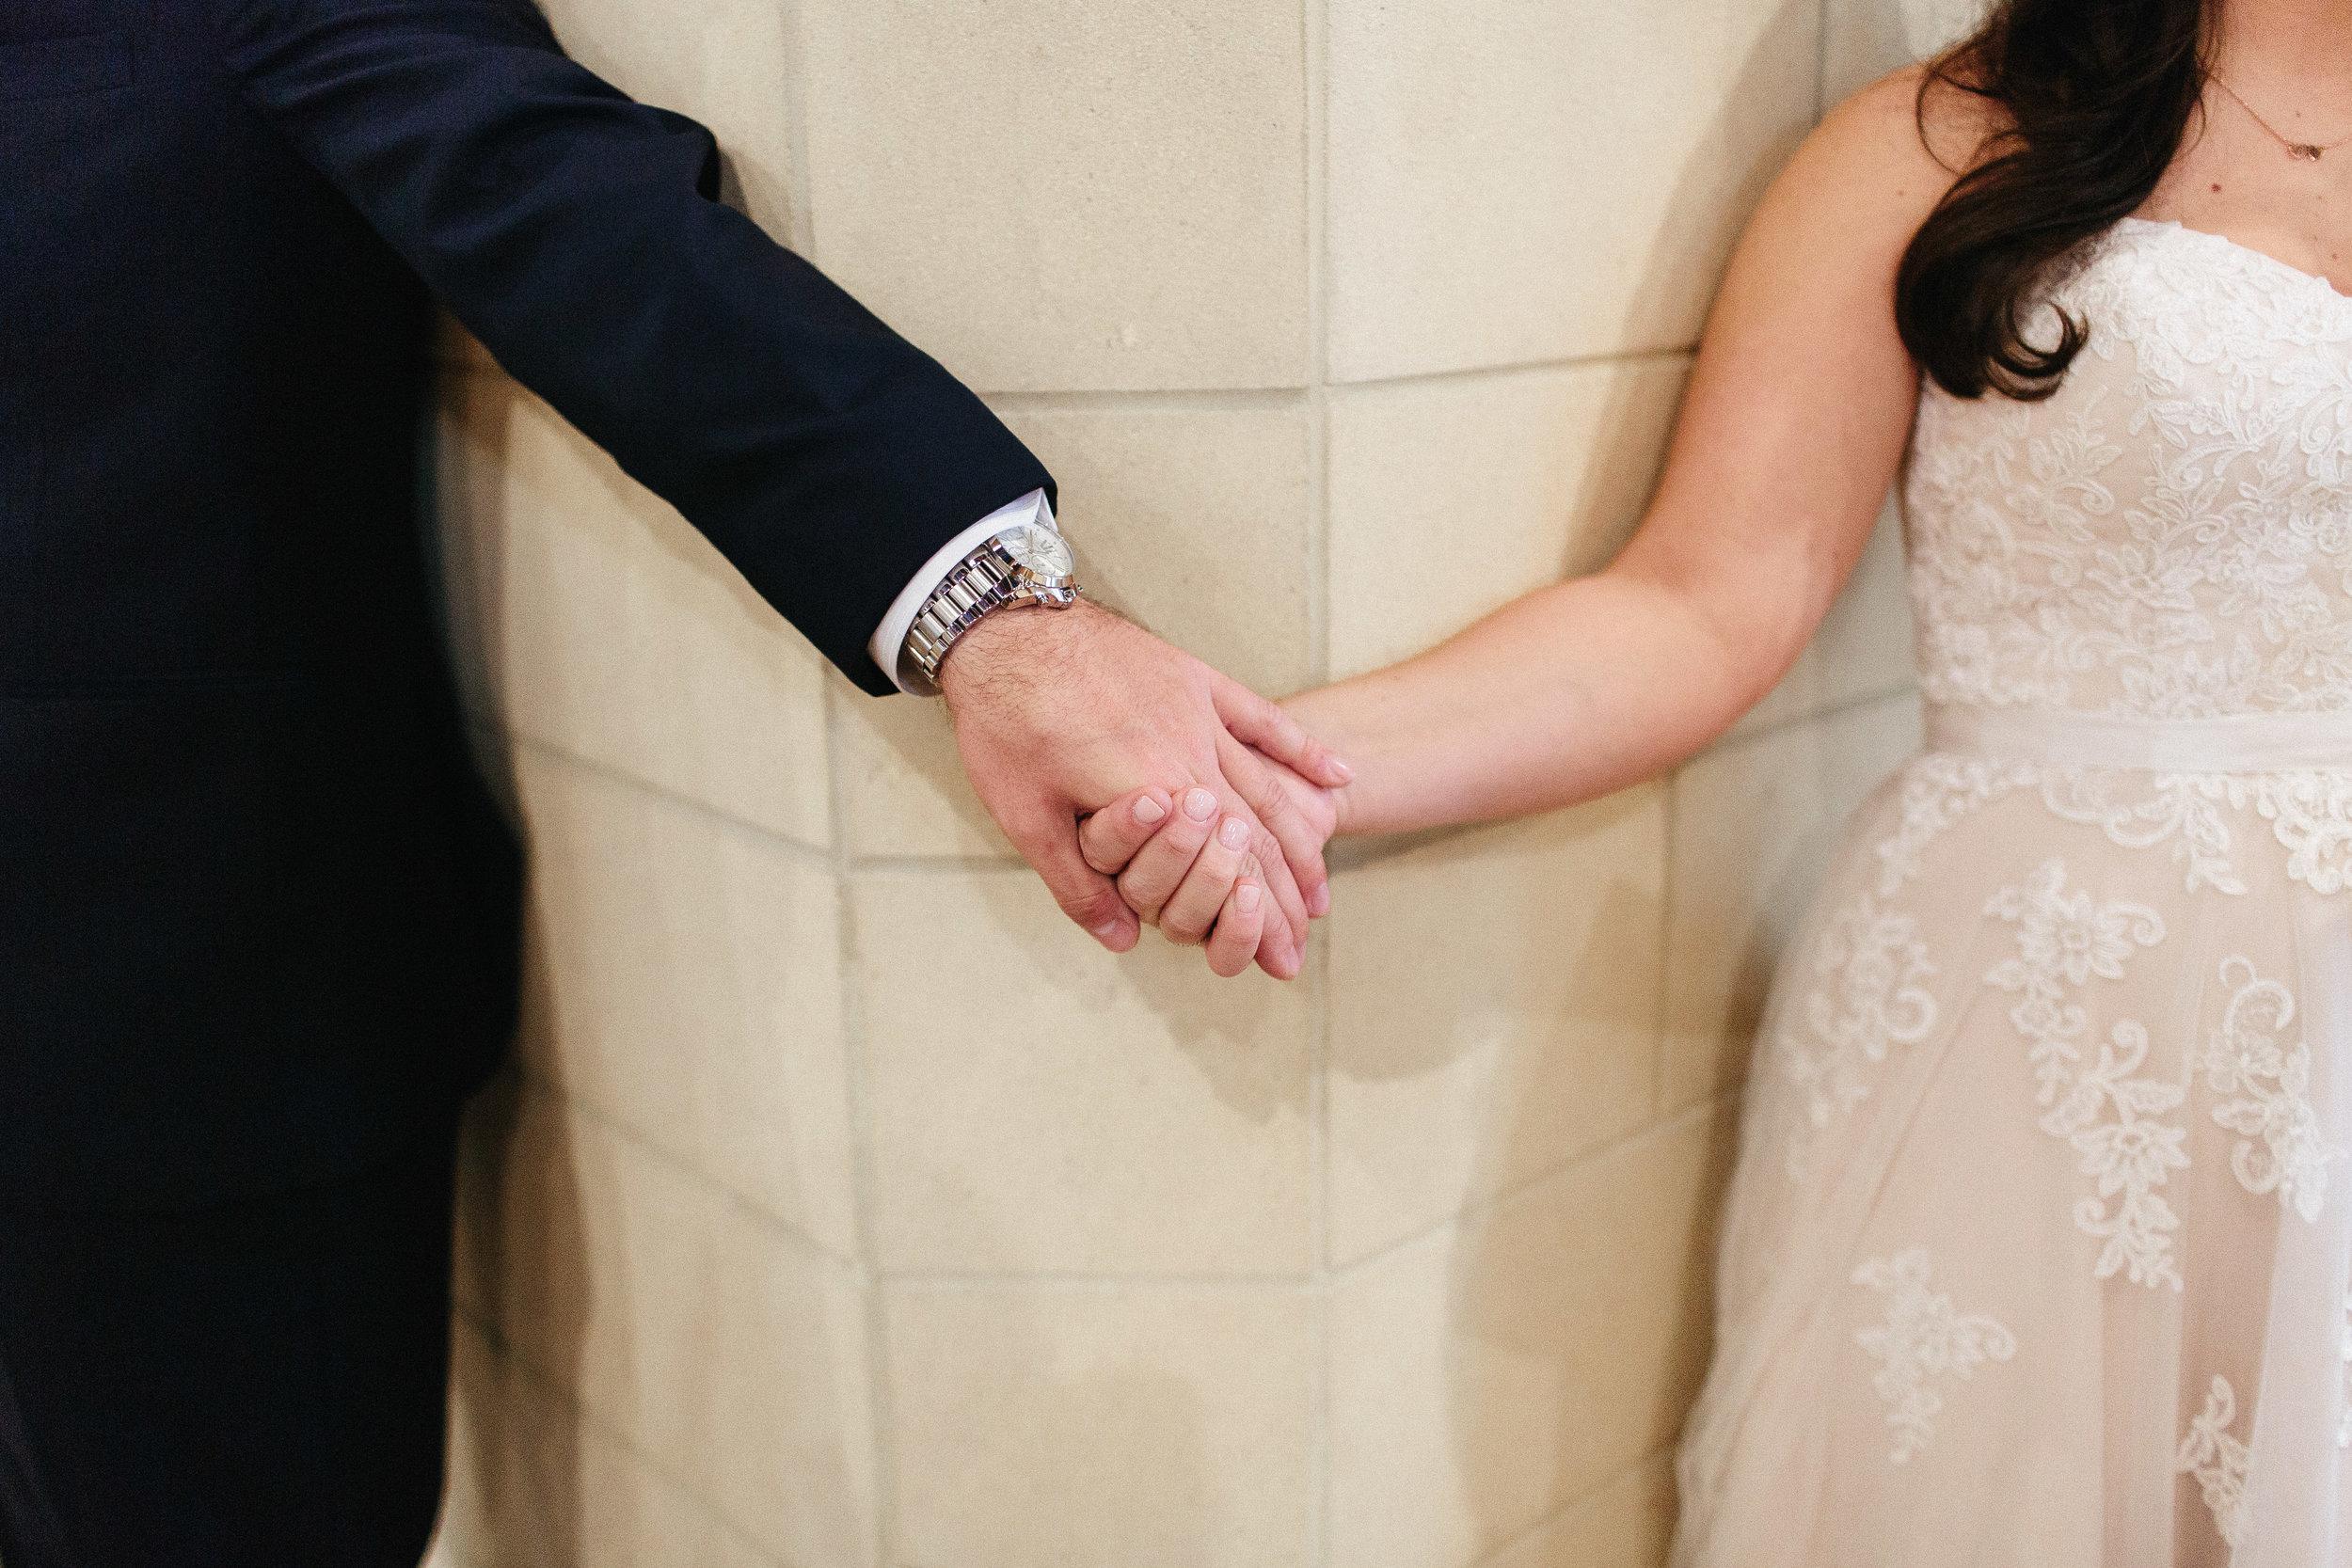 roswell_st_peter_chanel_catholic_avalon_hotel_alpharetta_wedding-1219.jpg